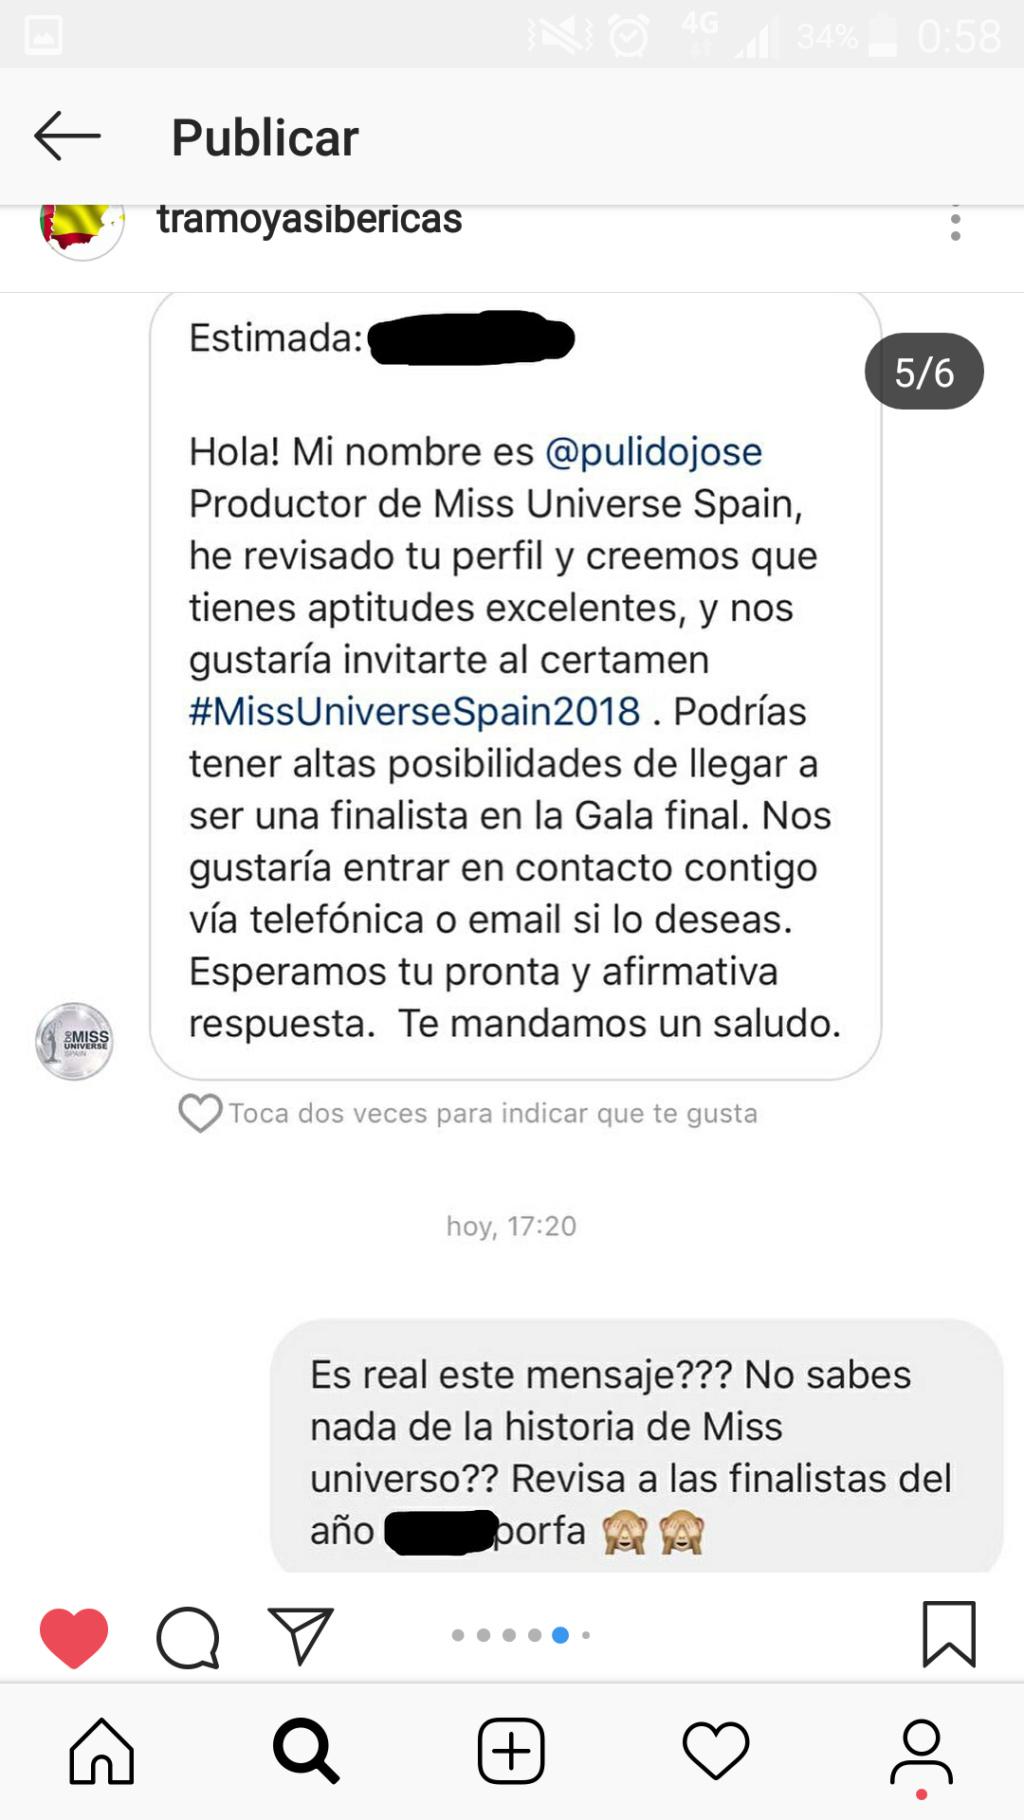 MUJER TRANSEXUAL ES CANDIDATA A MISS MONGOLIA UNIVERSO!!! - Página 3 Screen13